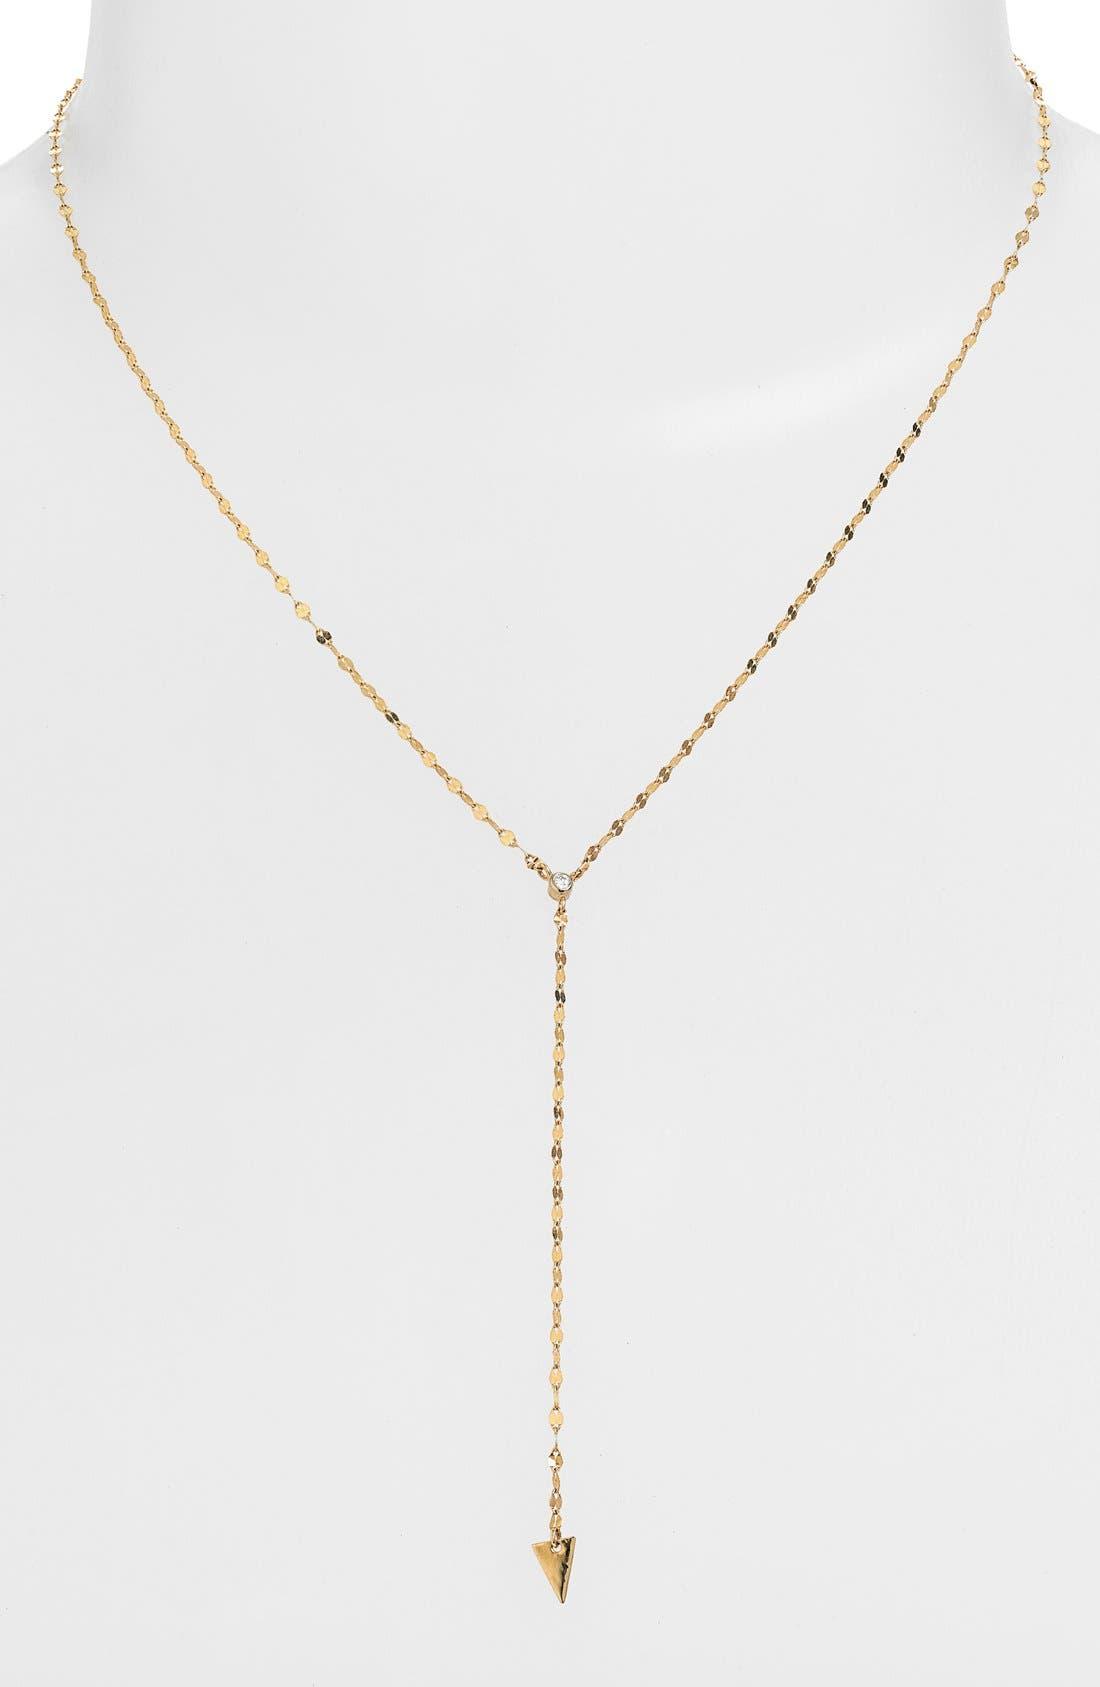 Main Image - Lana Jewelry 'Triangle' Diamond Y-Necklace